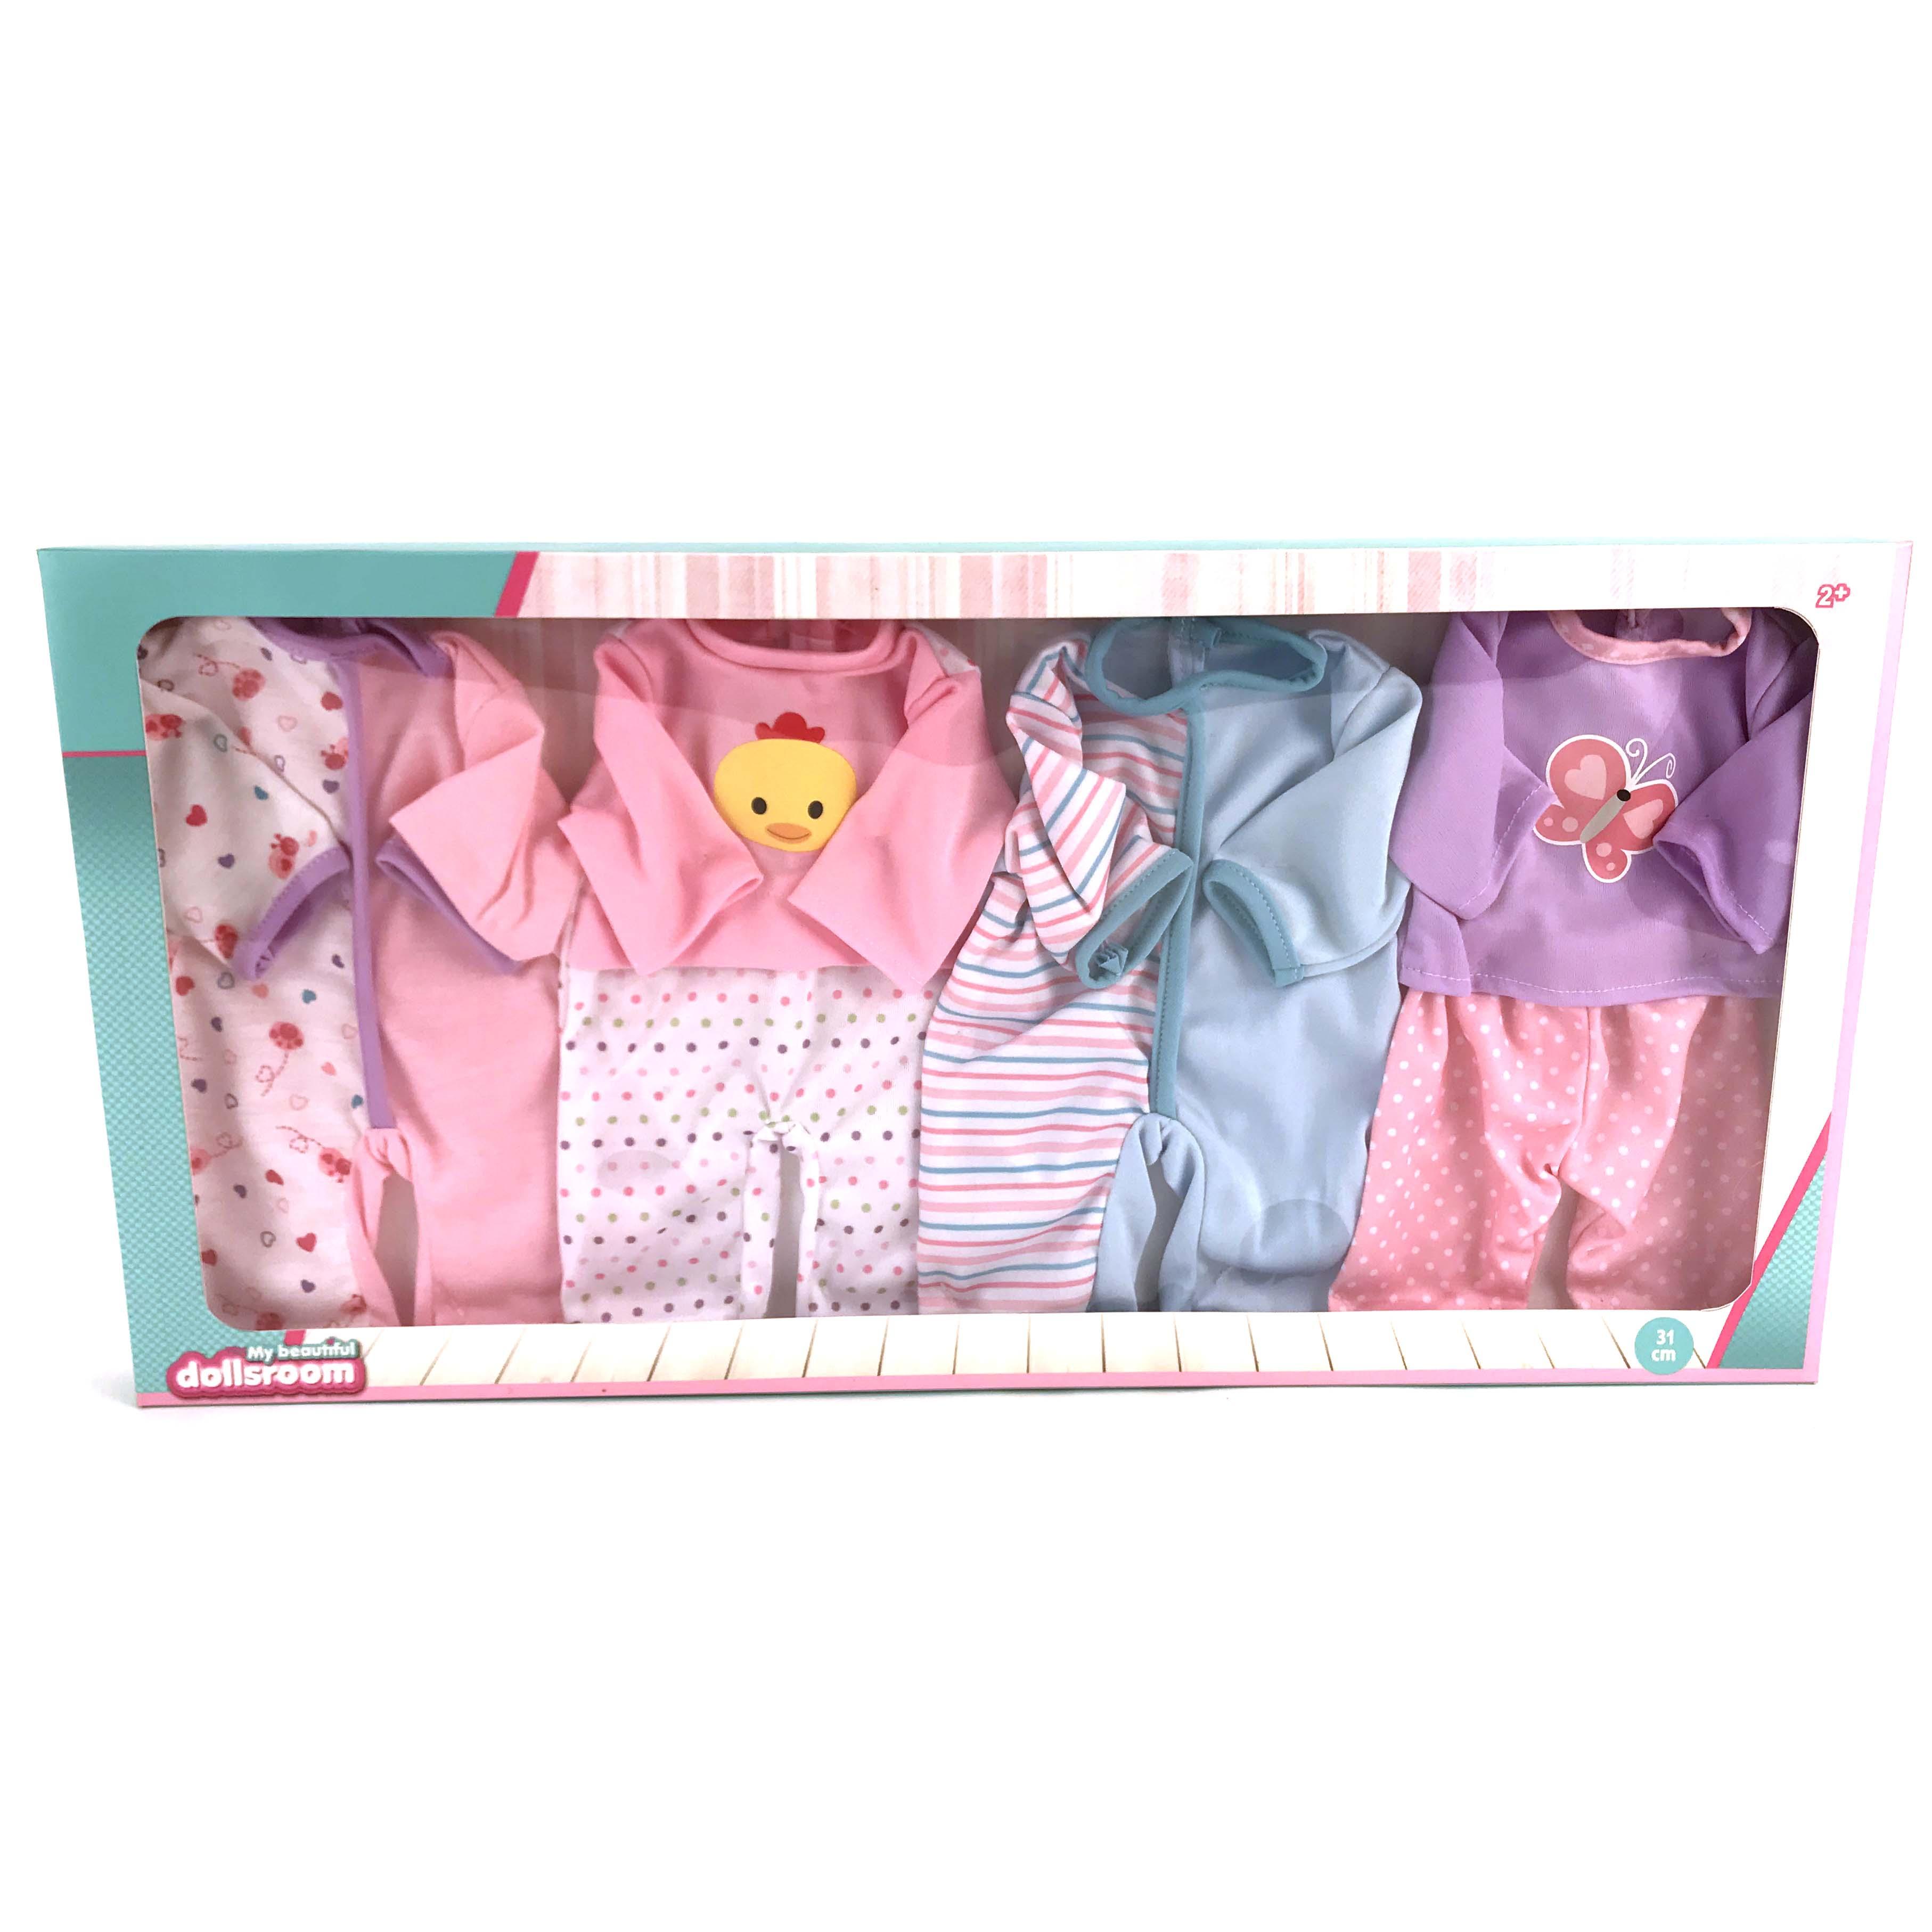 Afbeelding van Poppenkleding Dolls Room 41 Cm